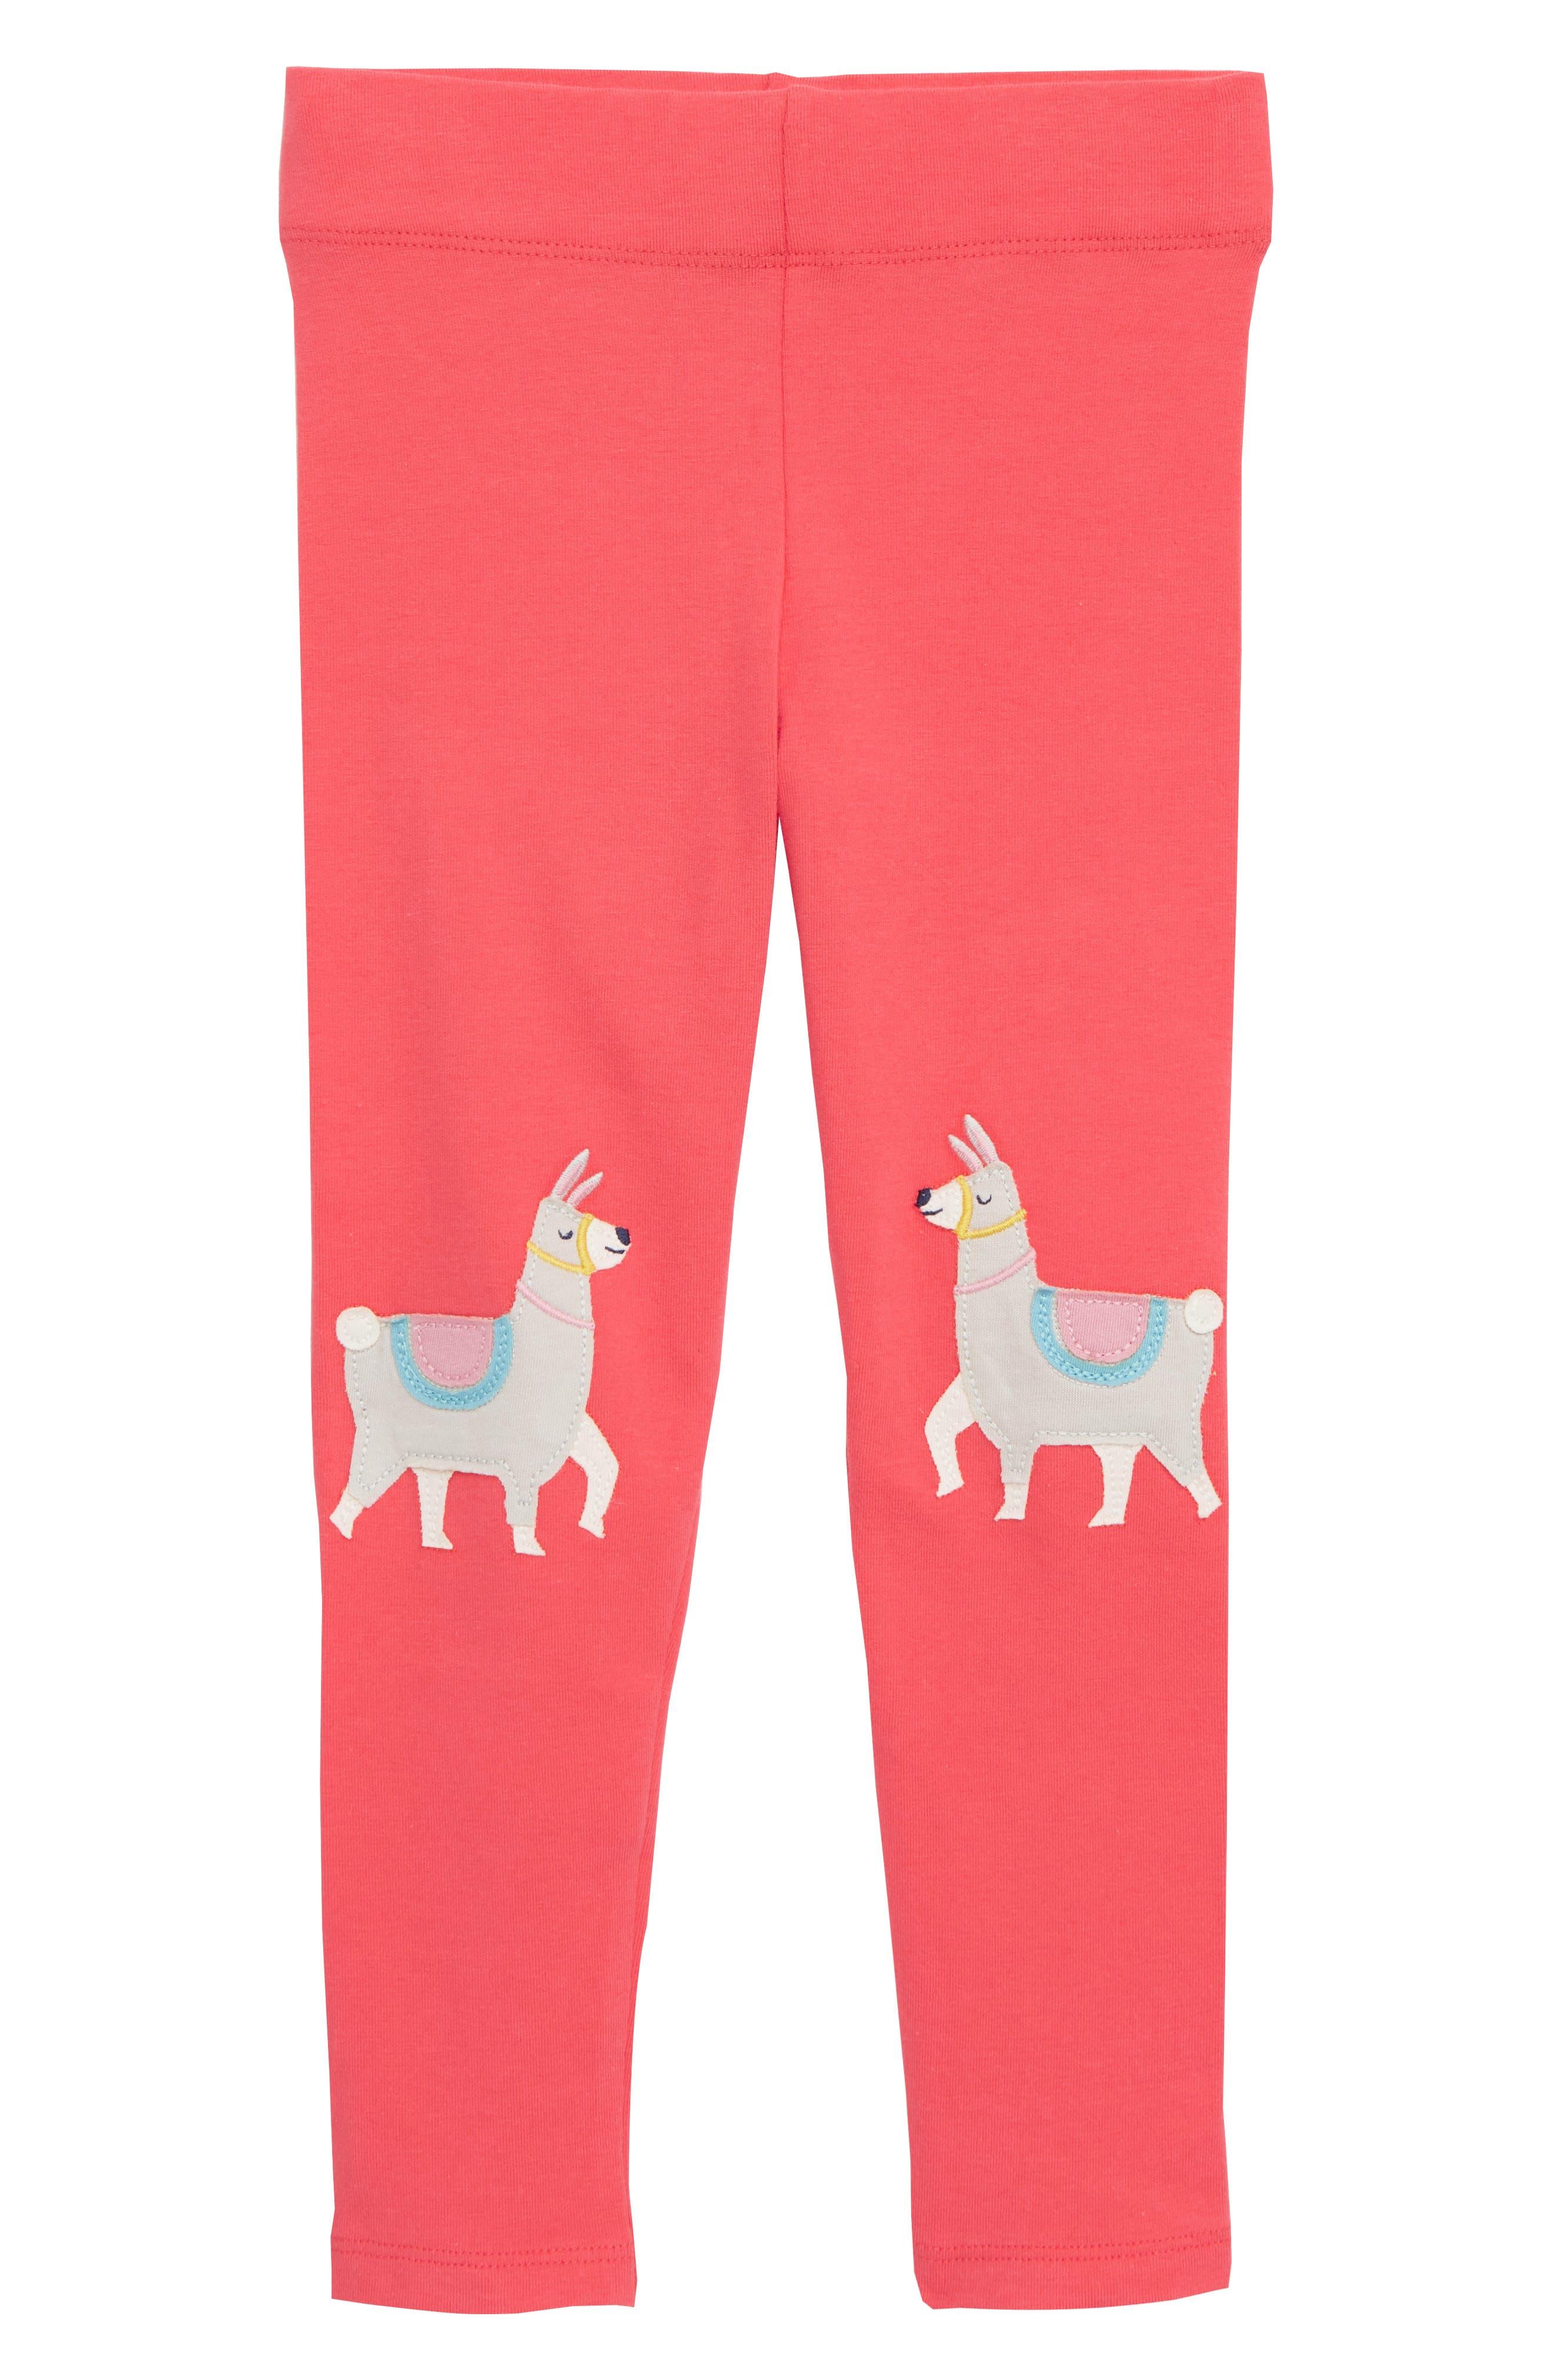 Toddler Girls Mini Boden Applique Leggings Size 34Y  Pink